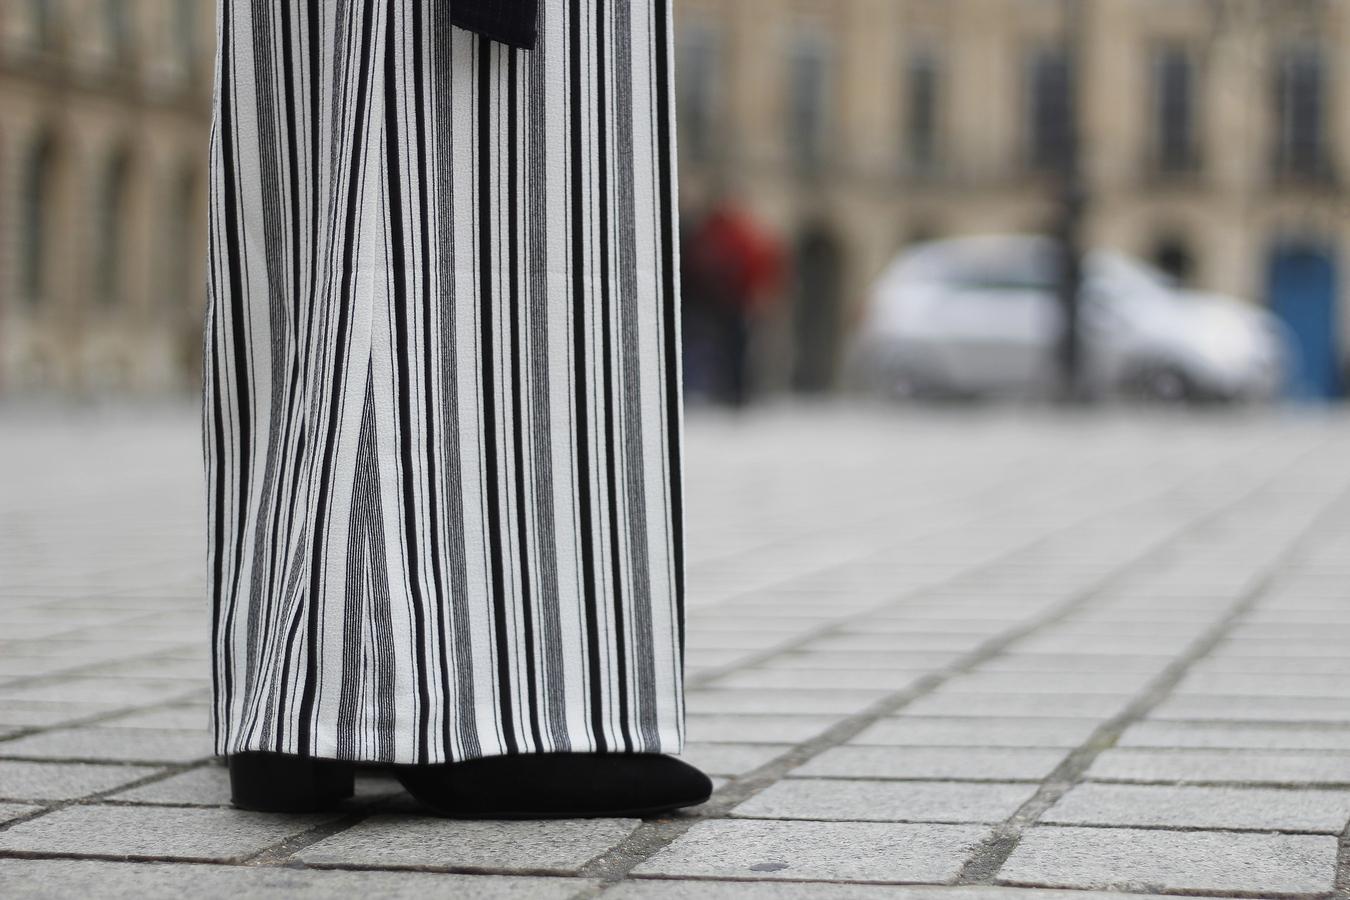 Blog mode femme Paris - Du style, Madame - Streetstyle - stripes